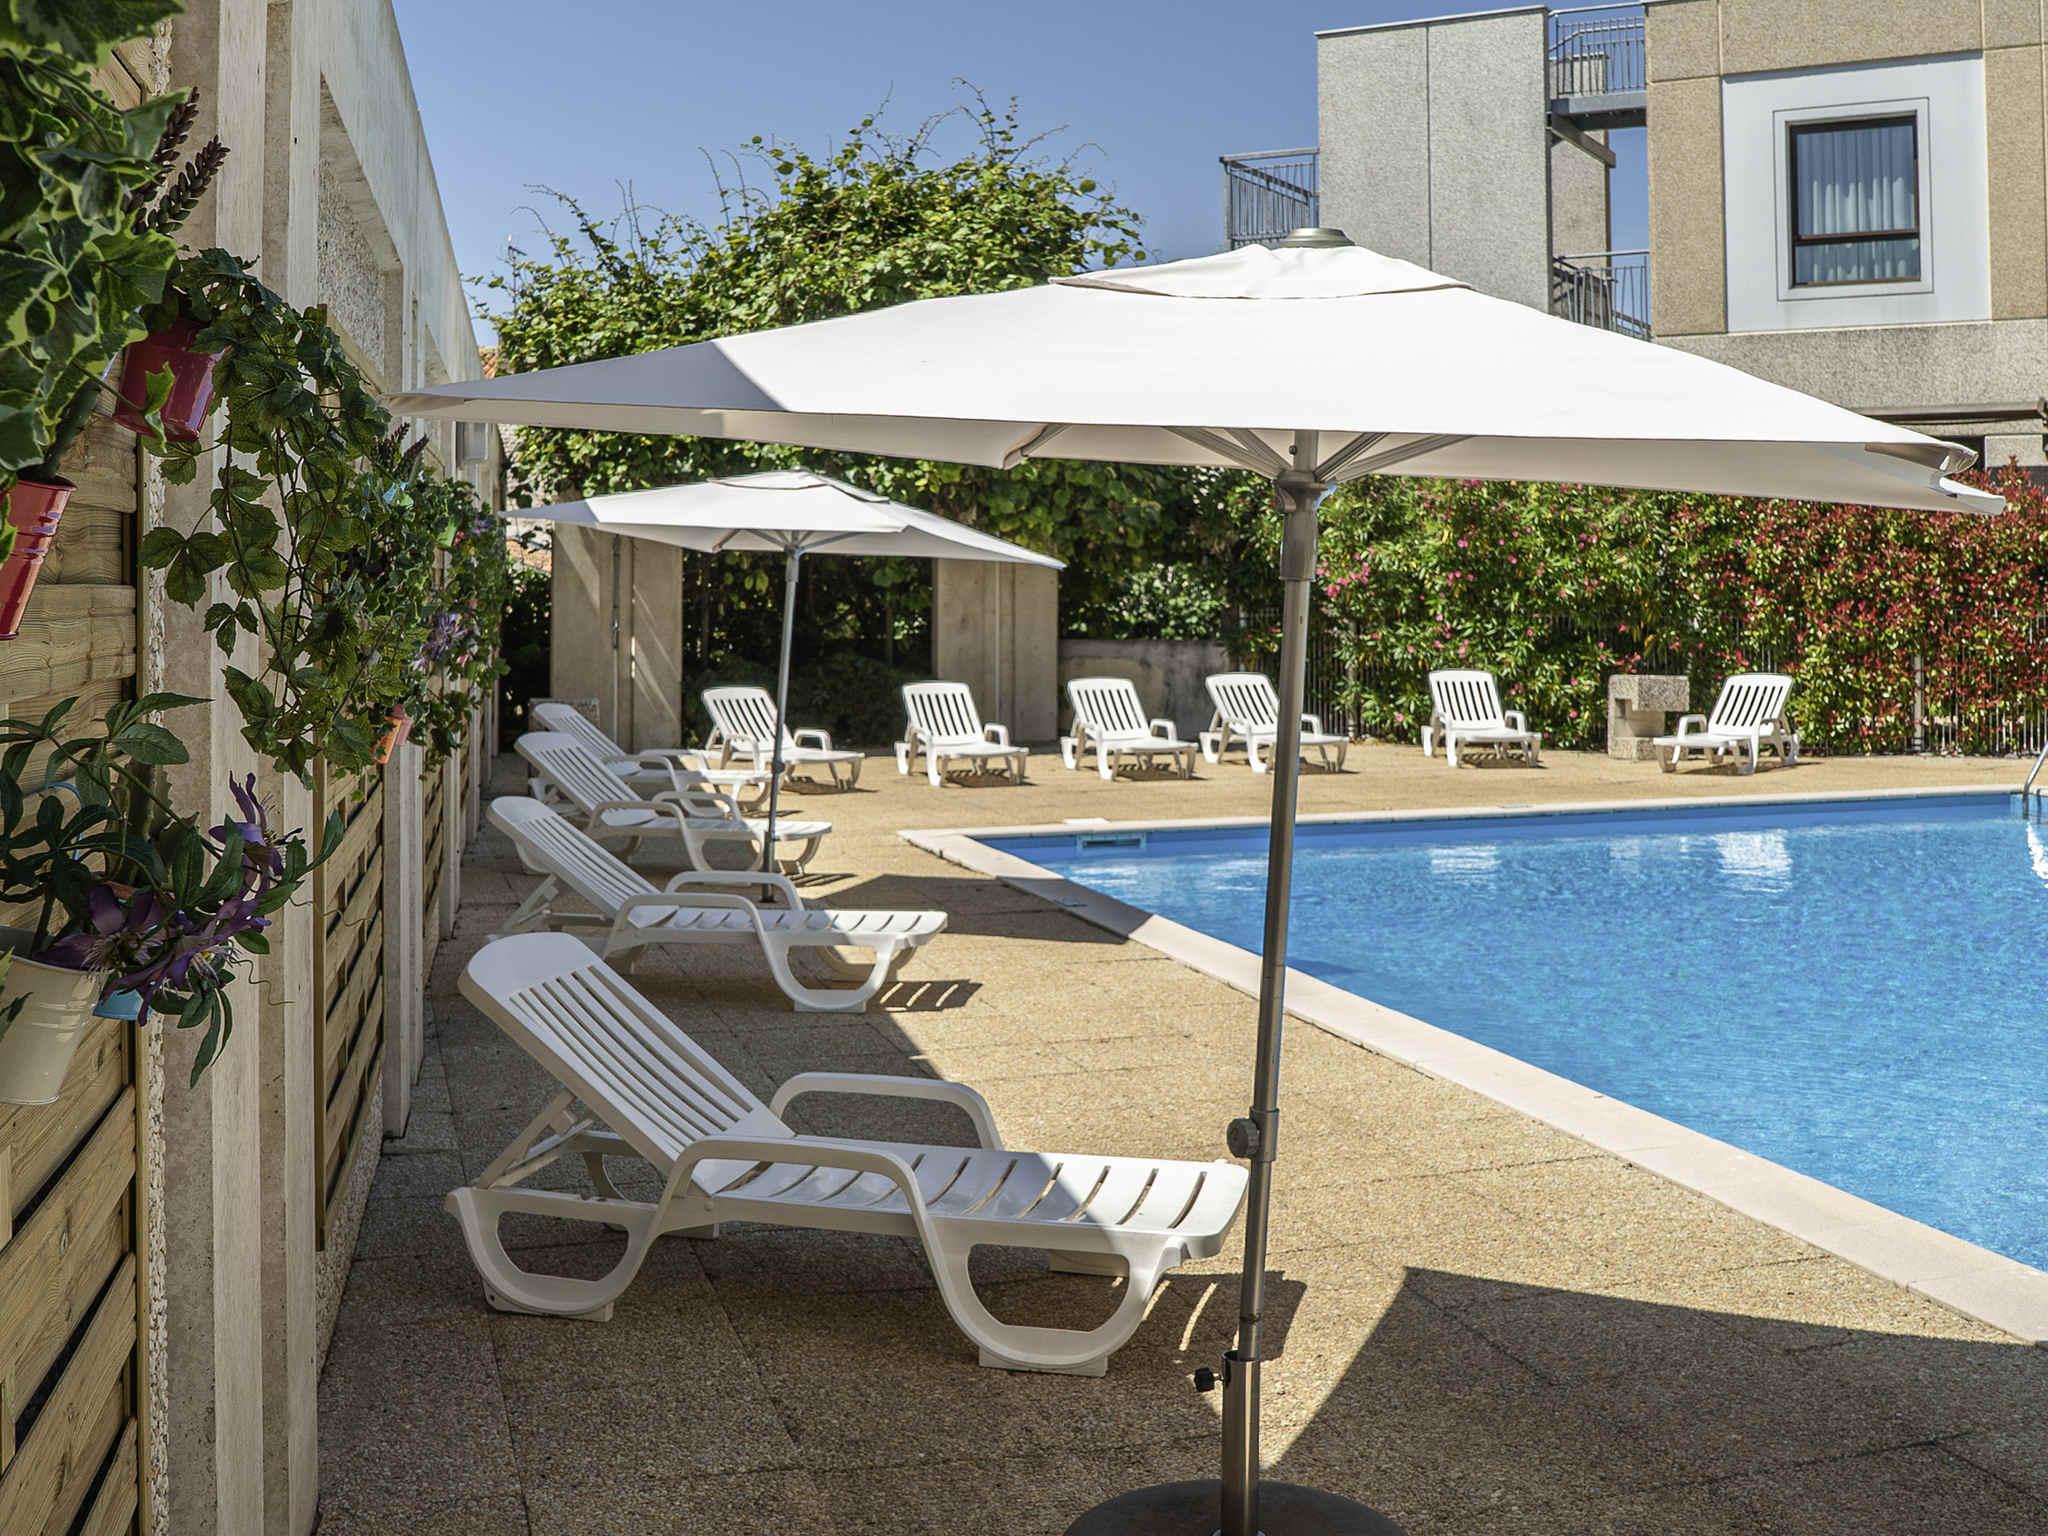 Hotel – Hôtel Mercure Niort Marais Poitevin